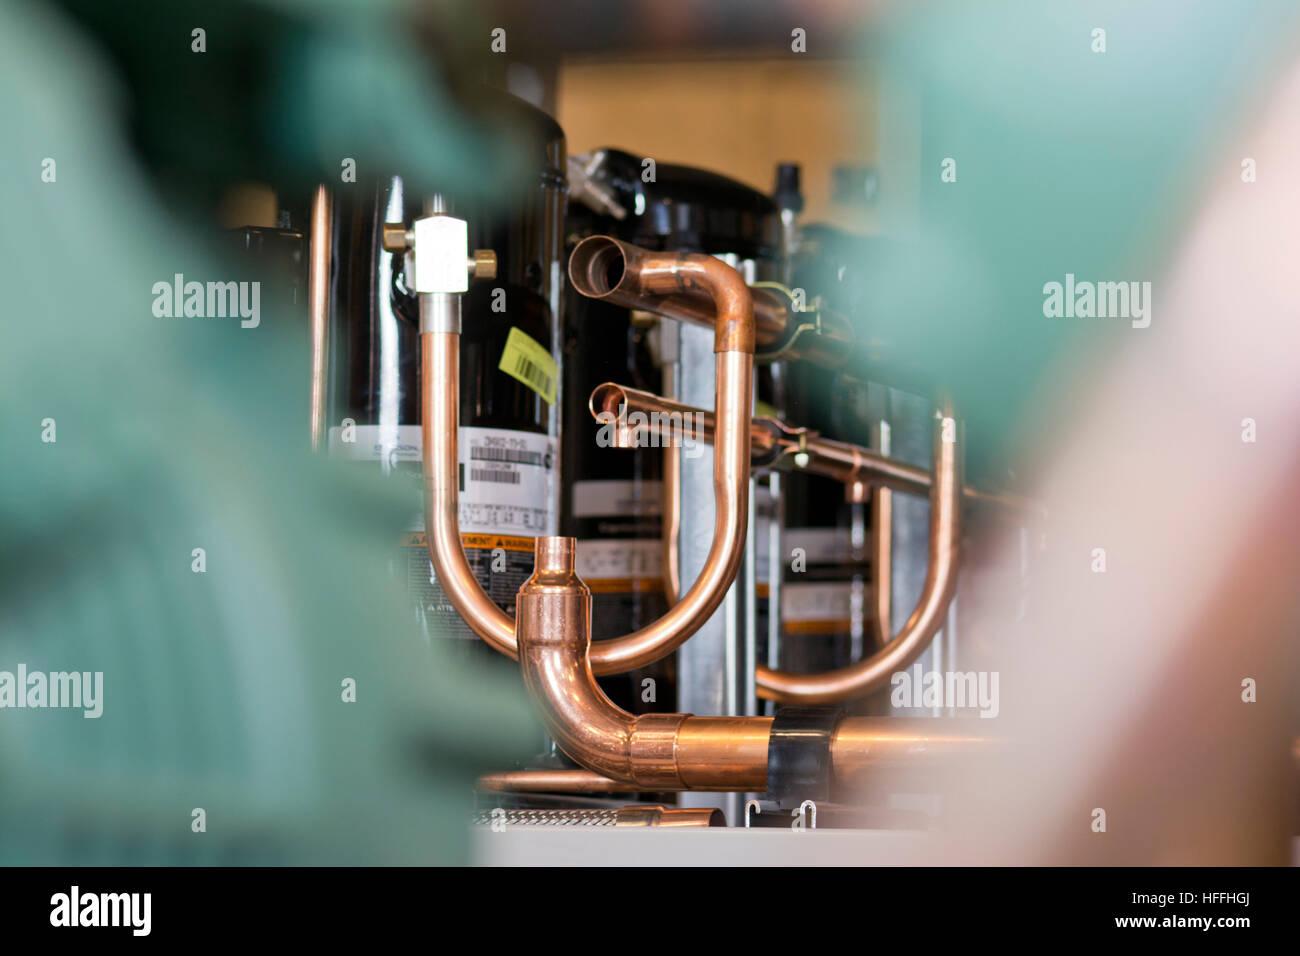 Refrigeration temperature compressors in warehouse Stock Photo